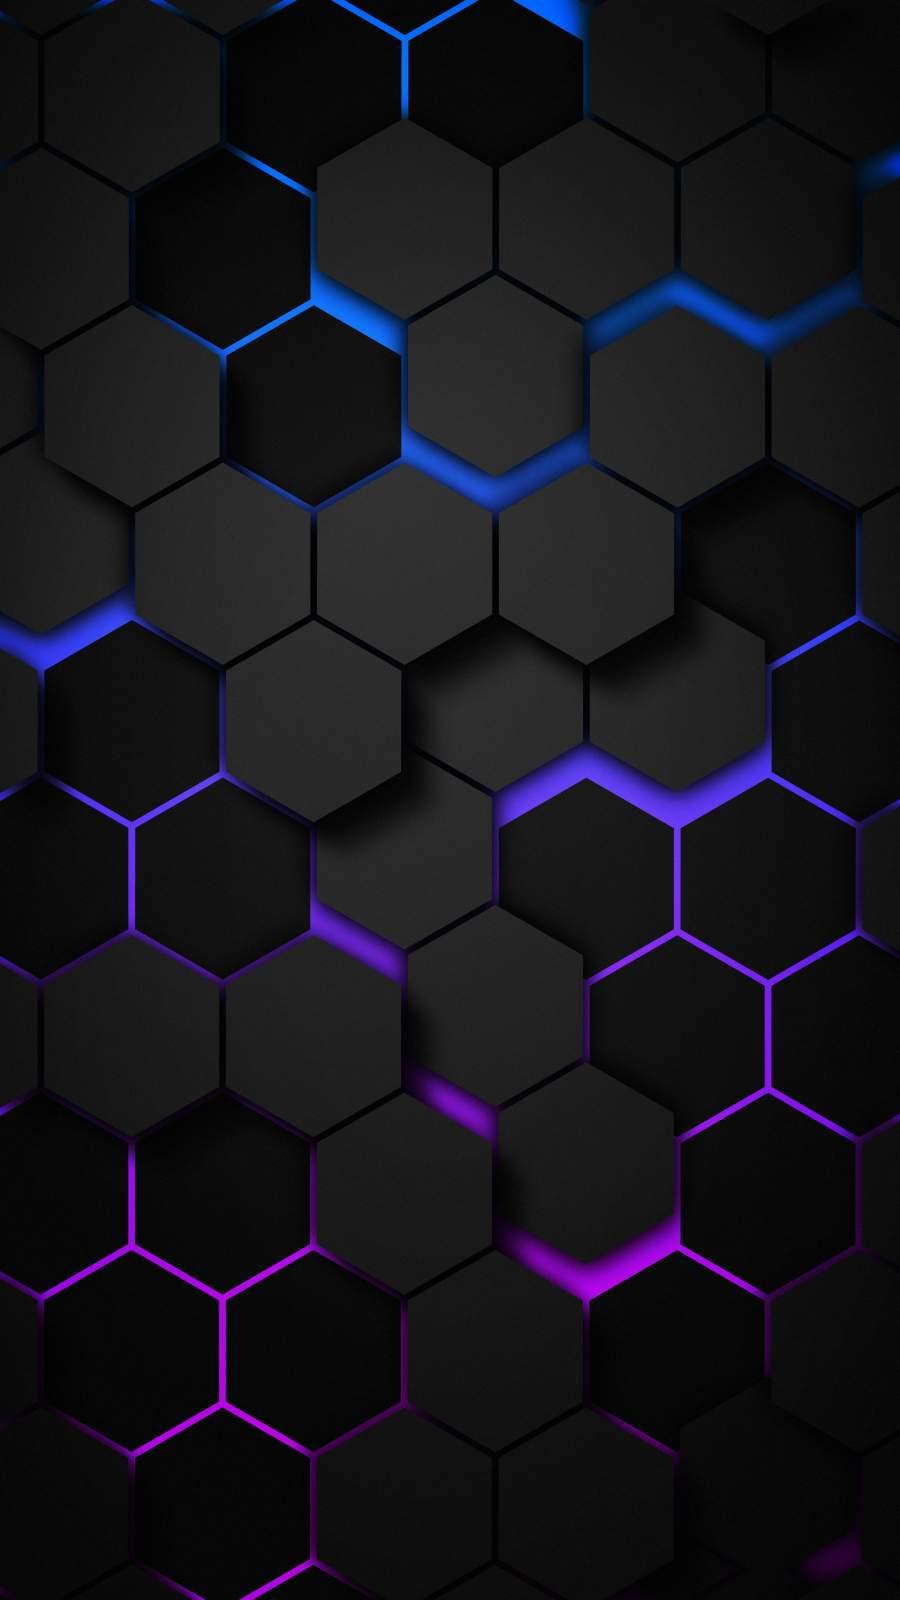 3D Hexagon iPhone Wallpaper